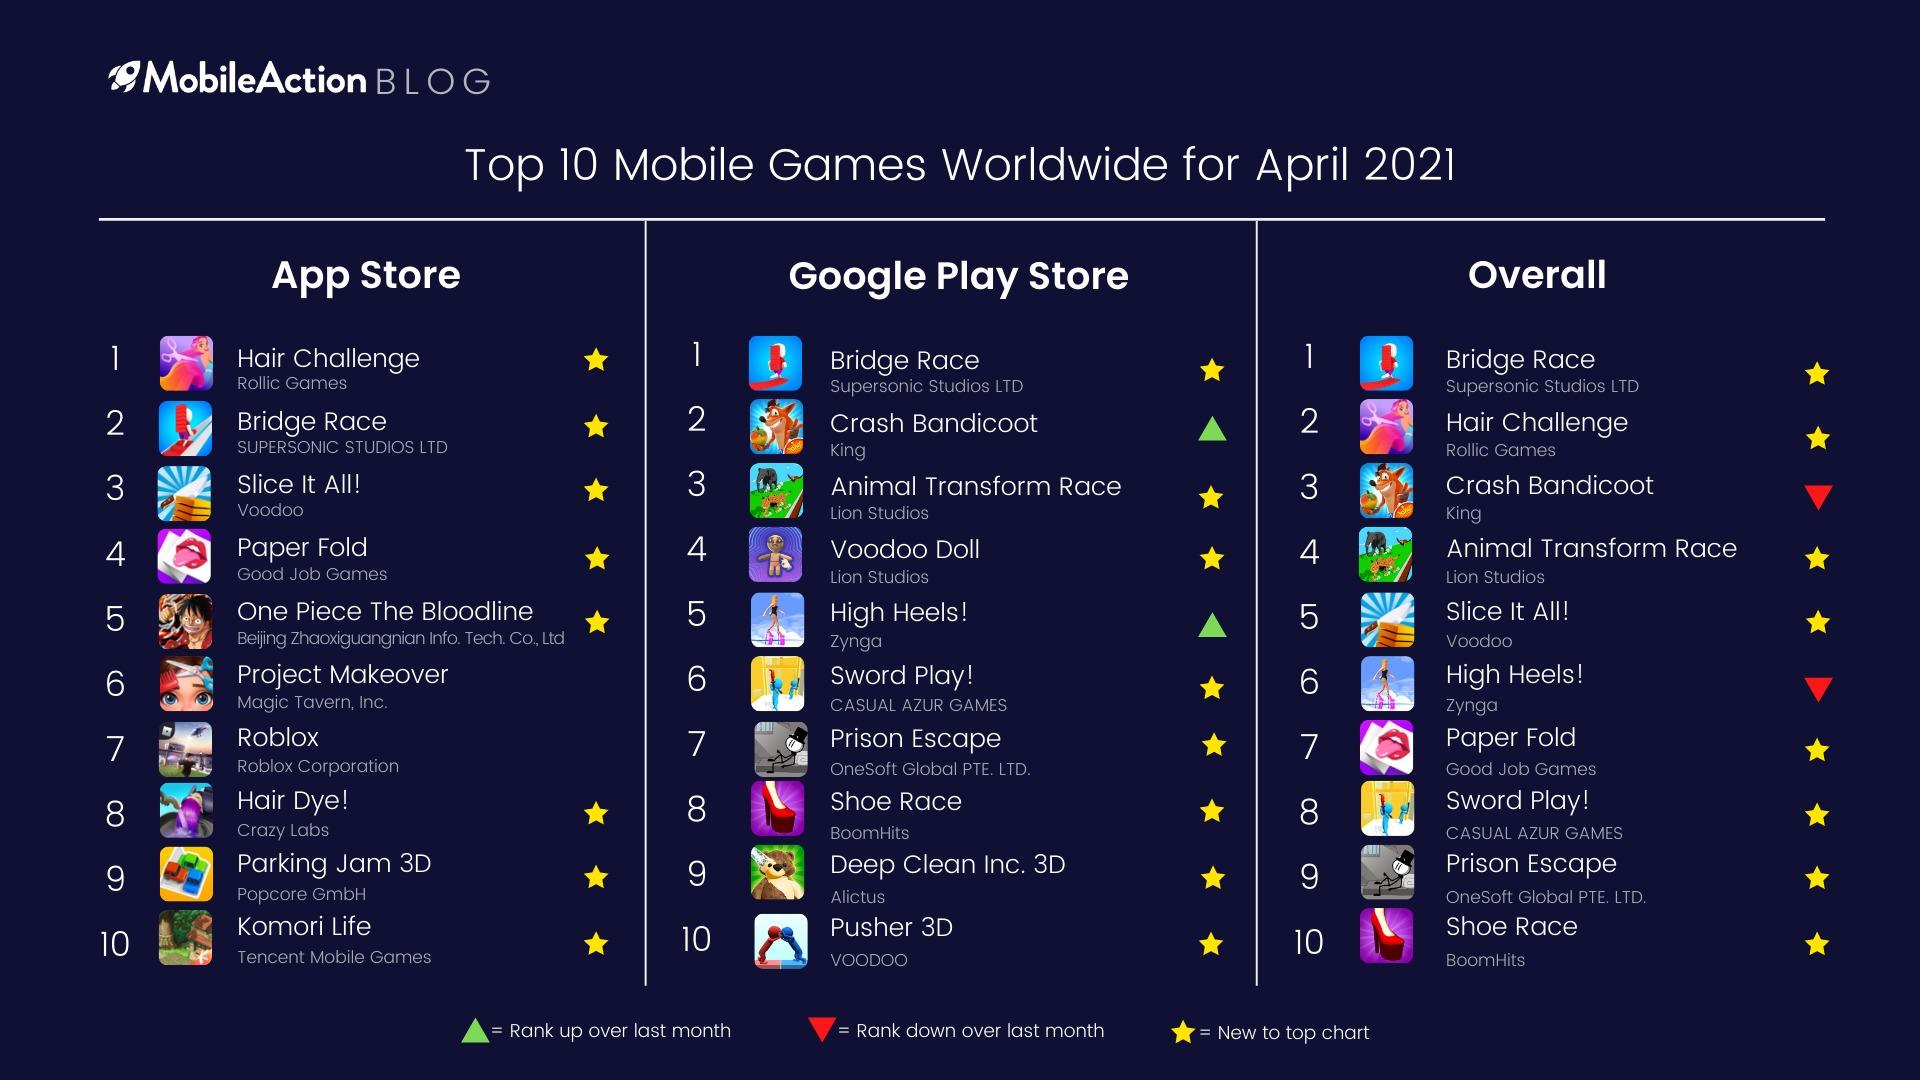 Top 10 Games April 2021 Worldwide